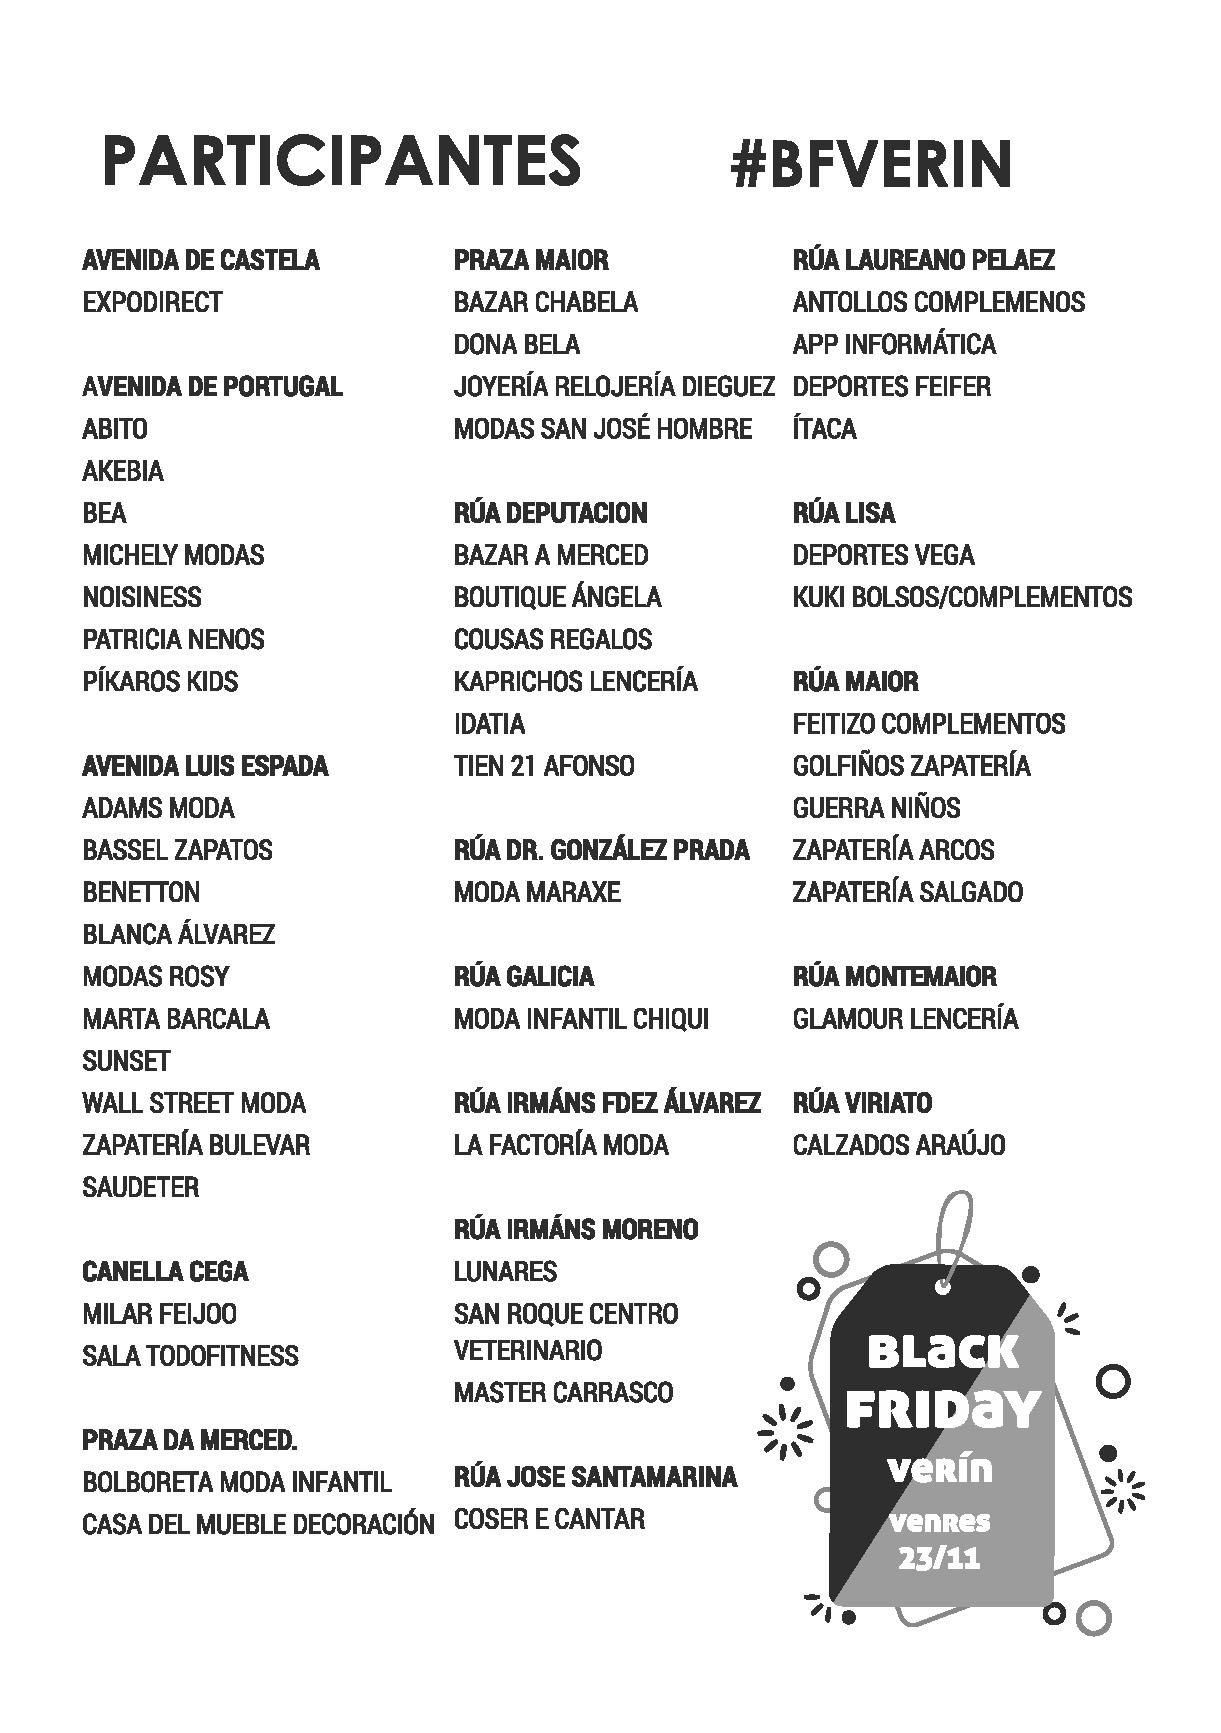 Black Friday Verín 2018